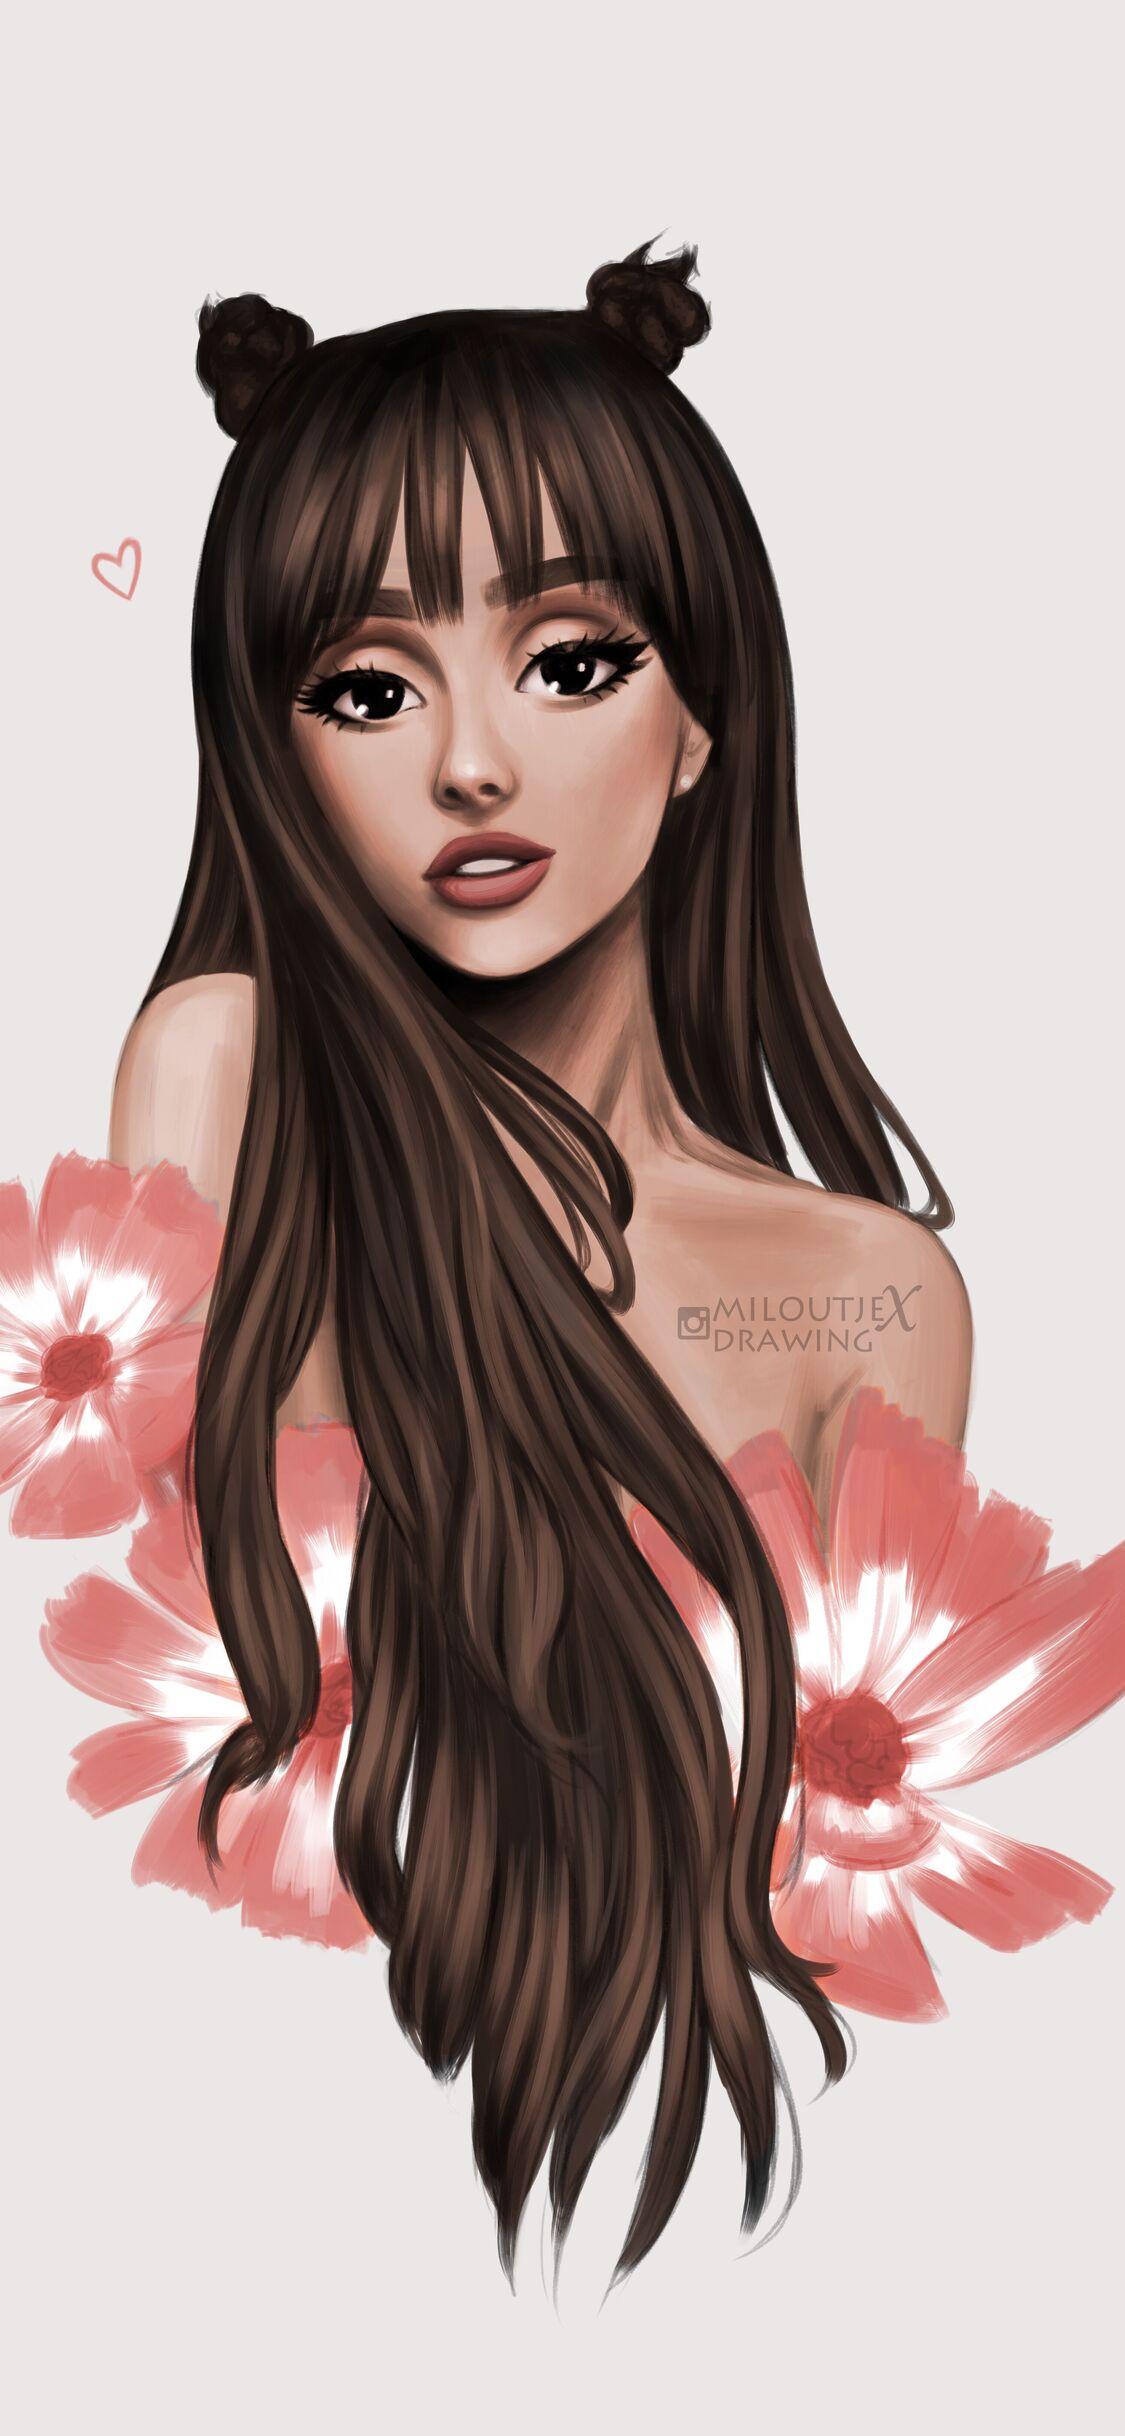 1125x2436 Ariana Grande Cartoon Art 5k Iphone Xs Iphone 10 Iphone